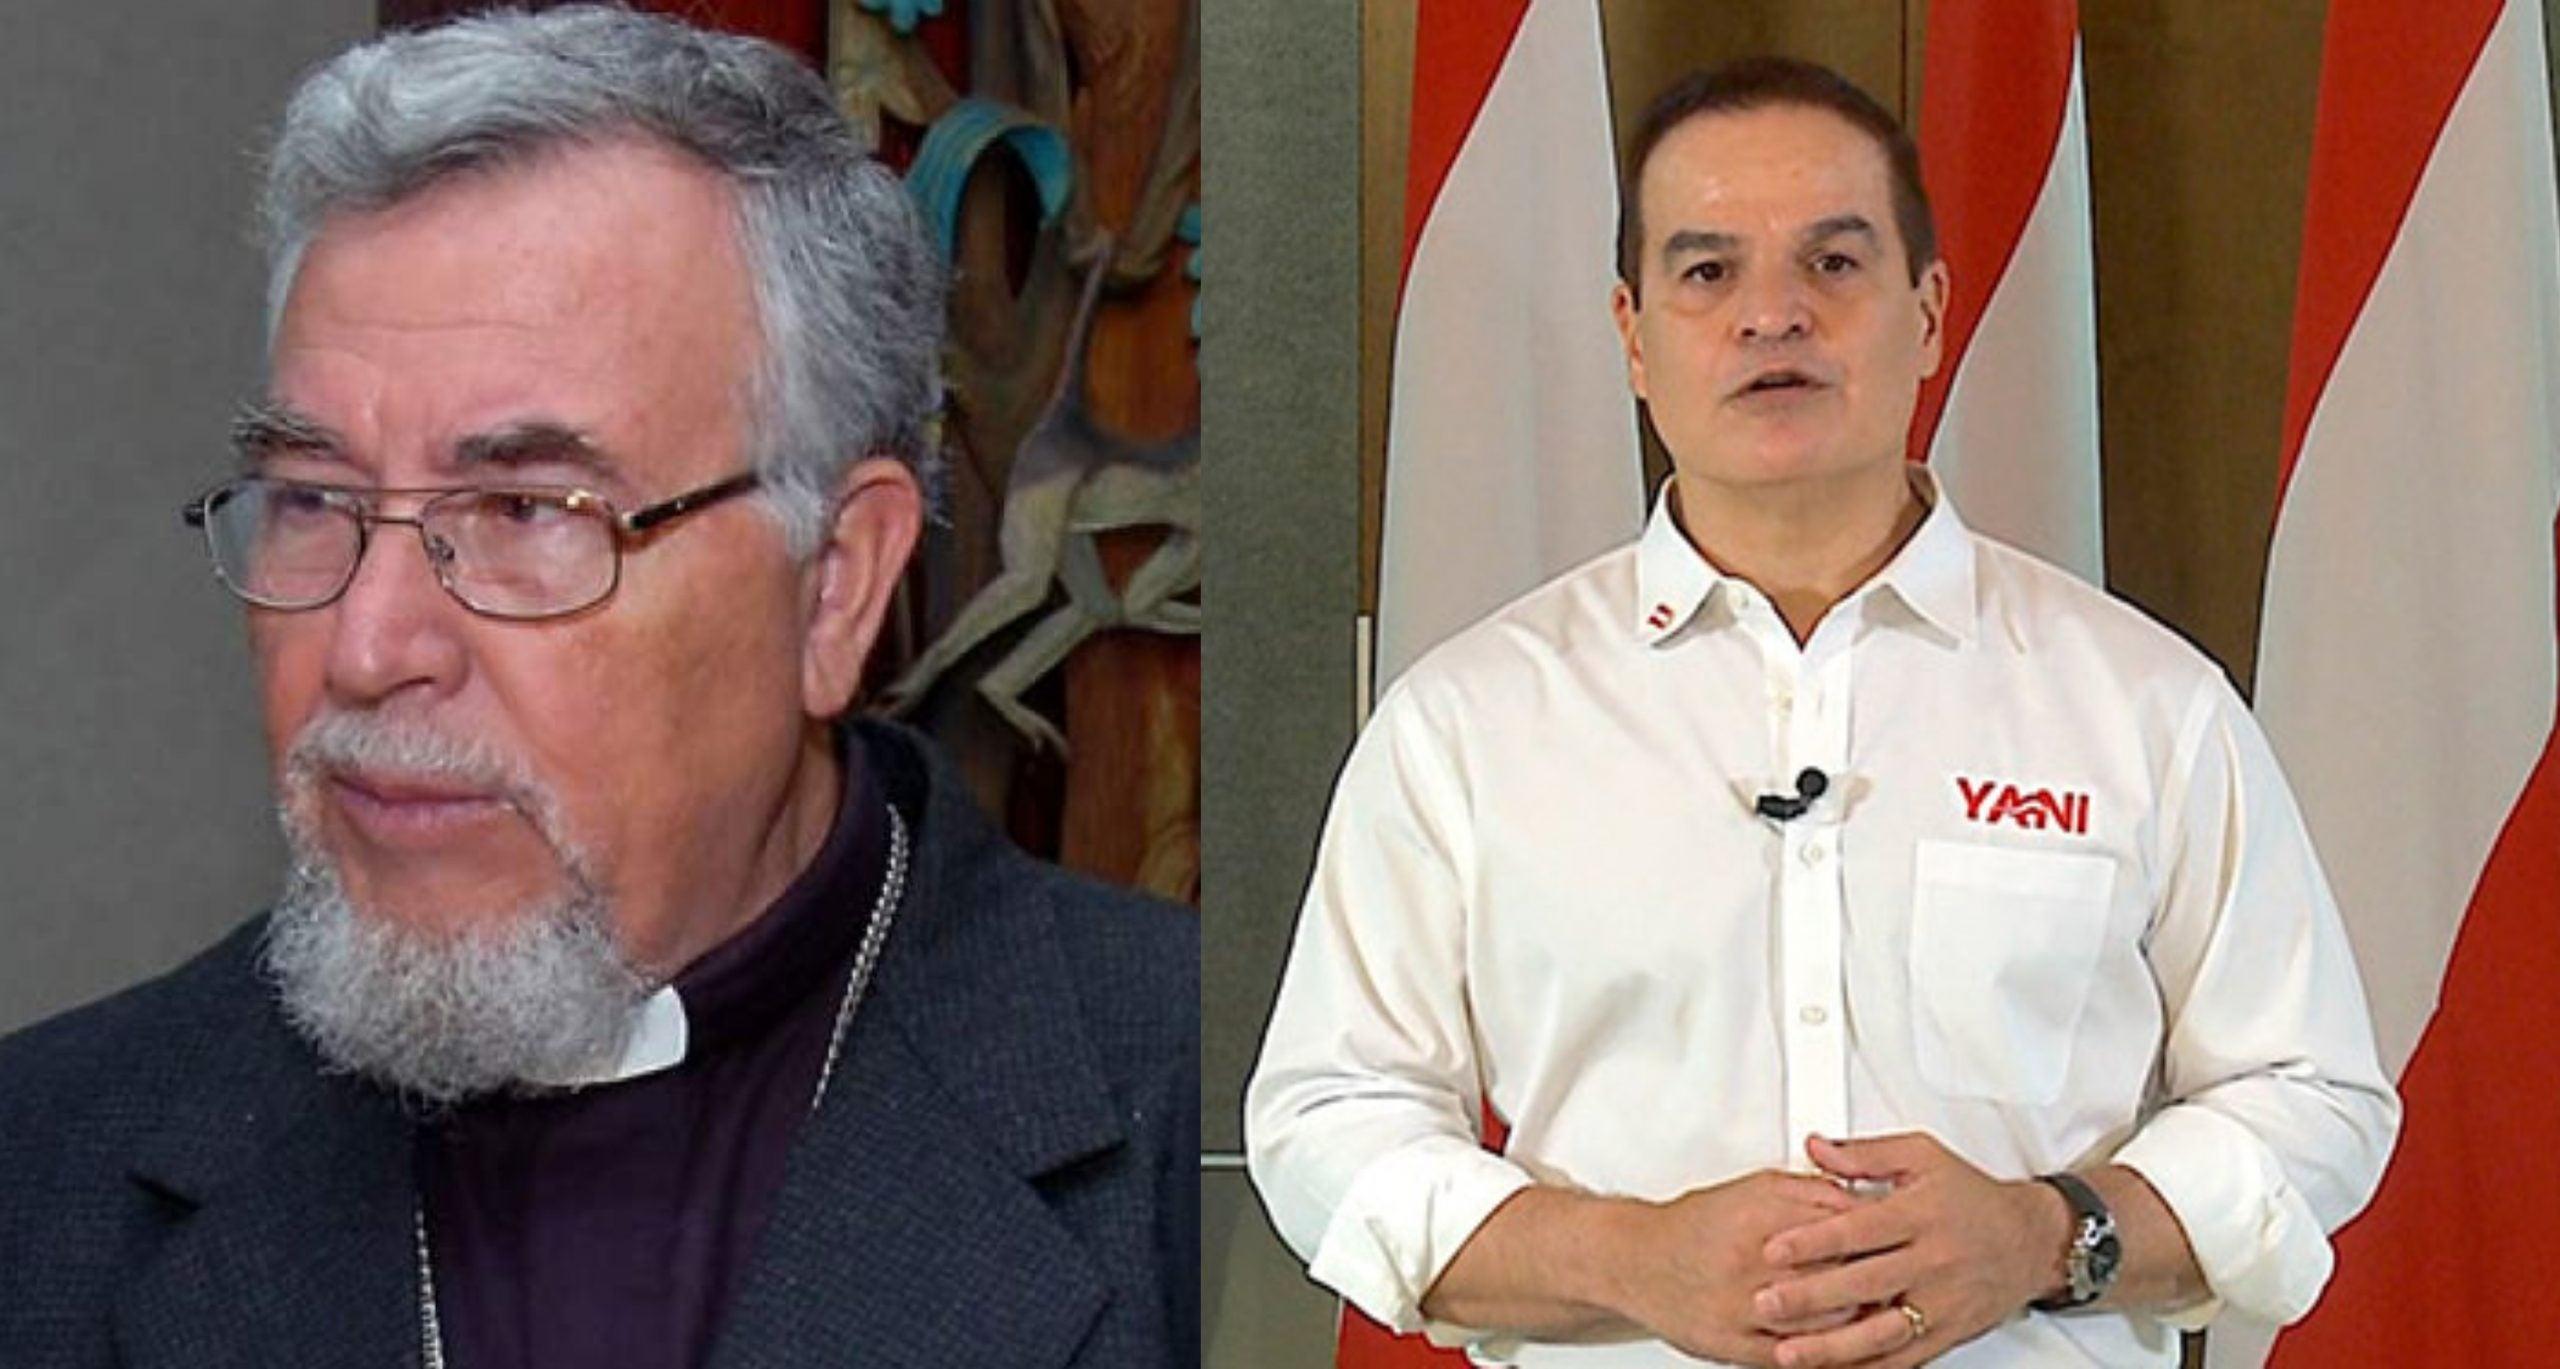 Obispo Luis Alfonso Santos Yani mejor candidato